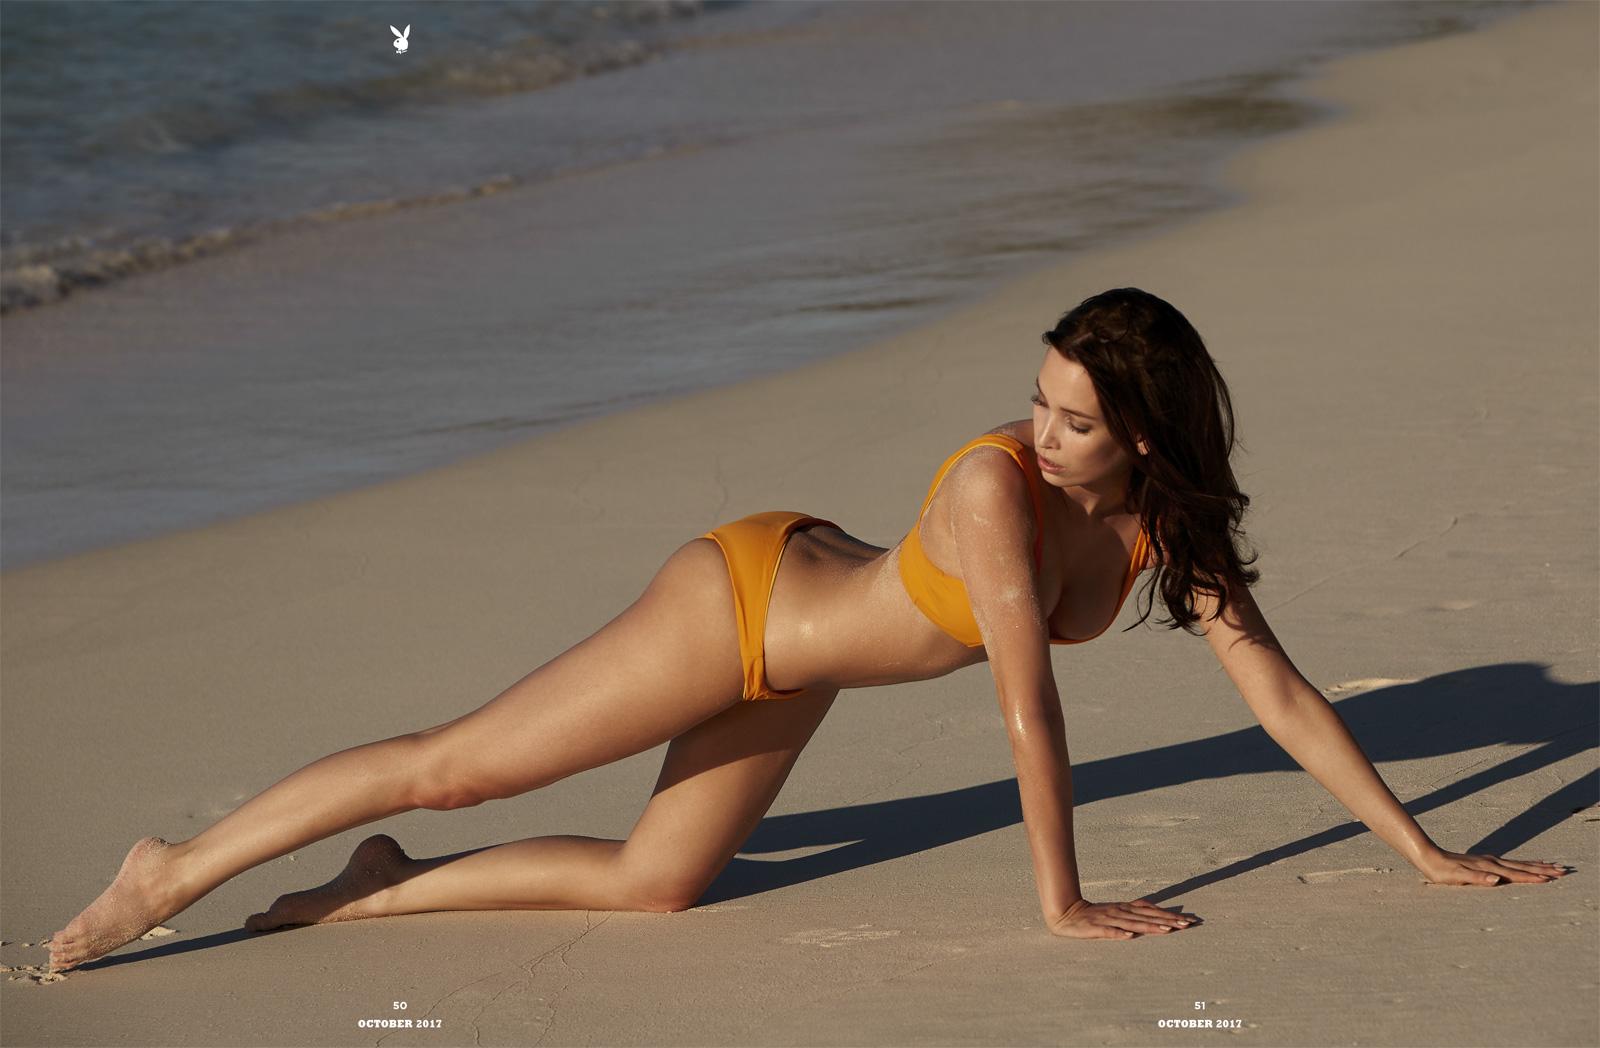 Jennette mccurdy ariana grande leaked pics